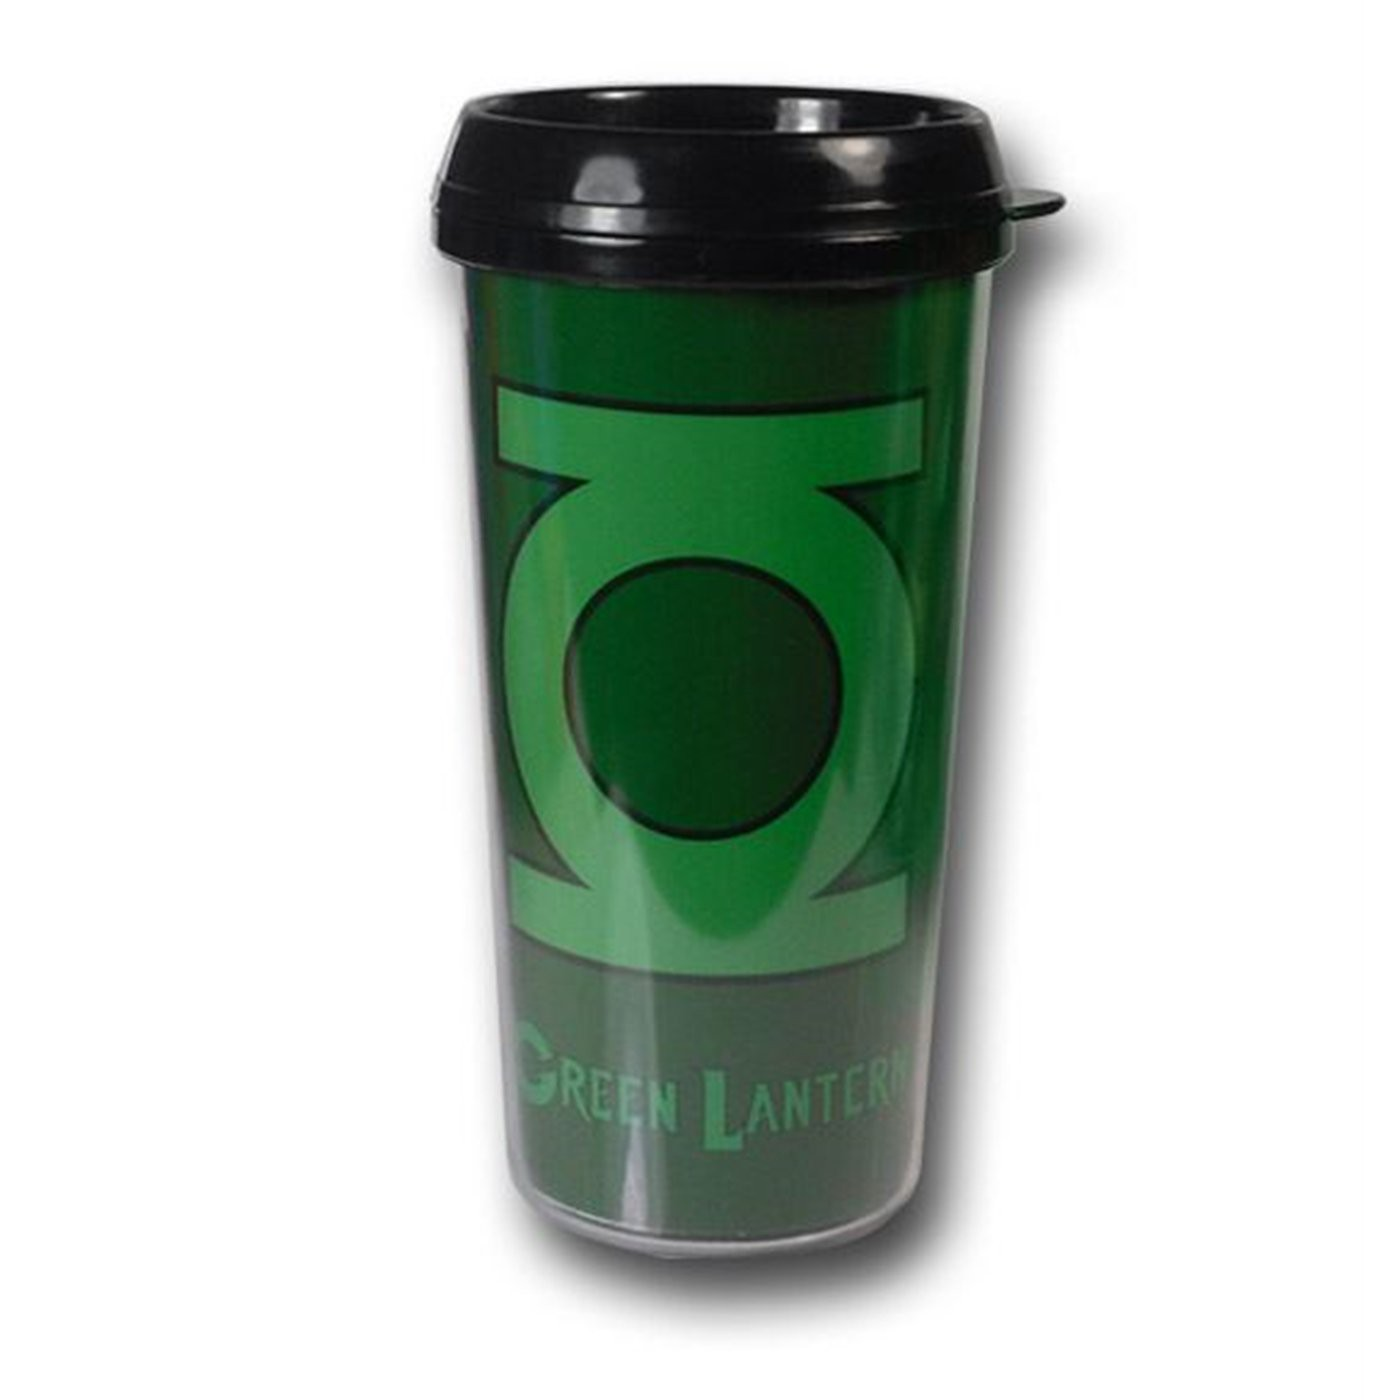 Green Lantern Green Symbol Plastic Travel Mug